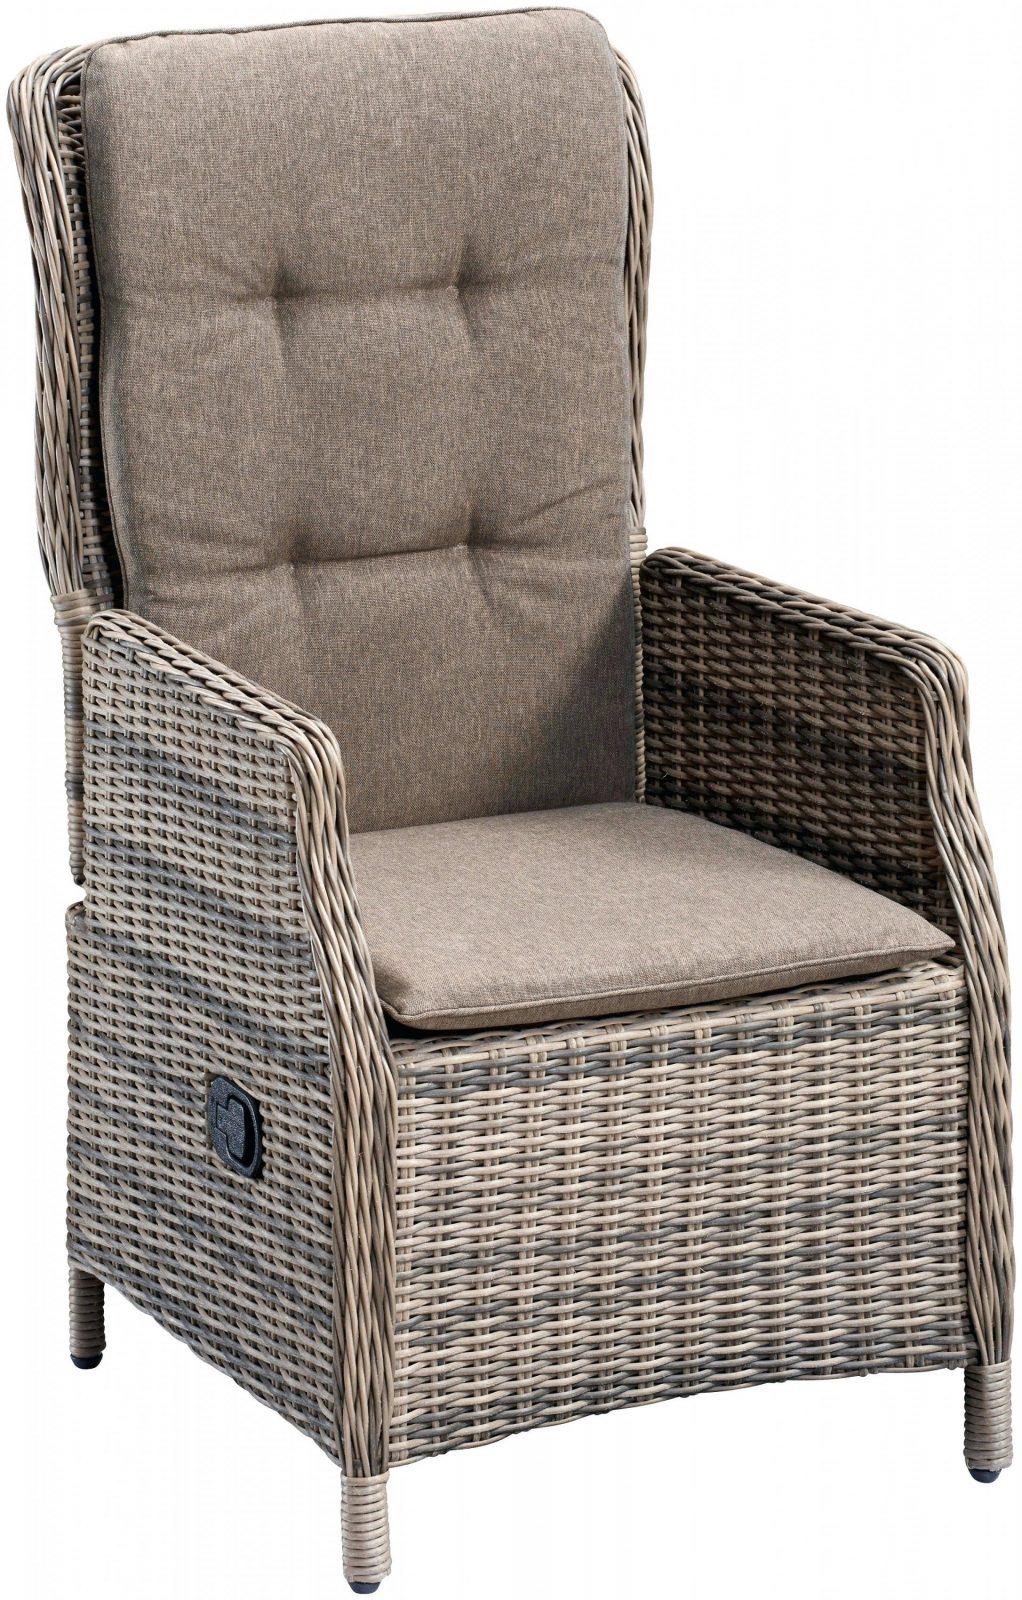 Polyrattan Sessel Verstellbarer Ra 1 4 Ckenlehne Genial Ehrfa von Polyrattan Sessel Verstellbarer Rückenlehne Bild